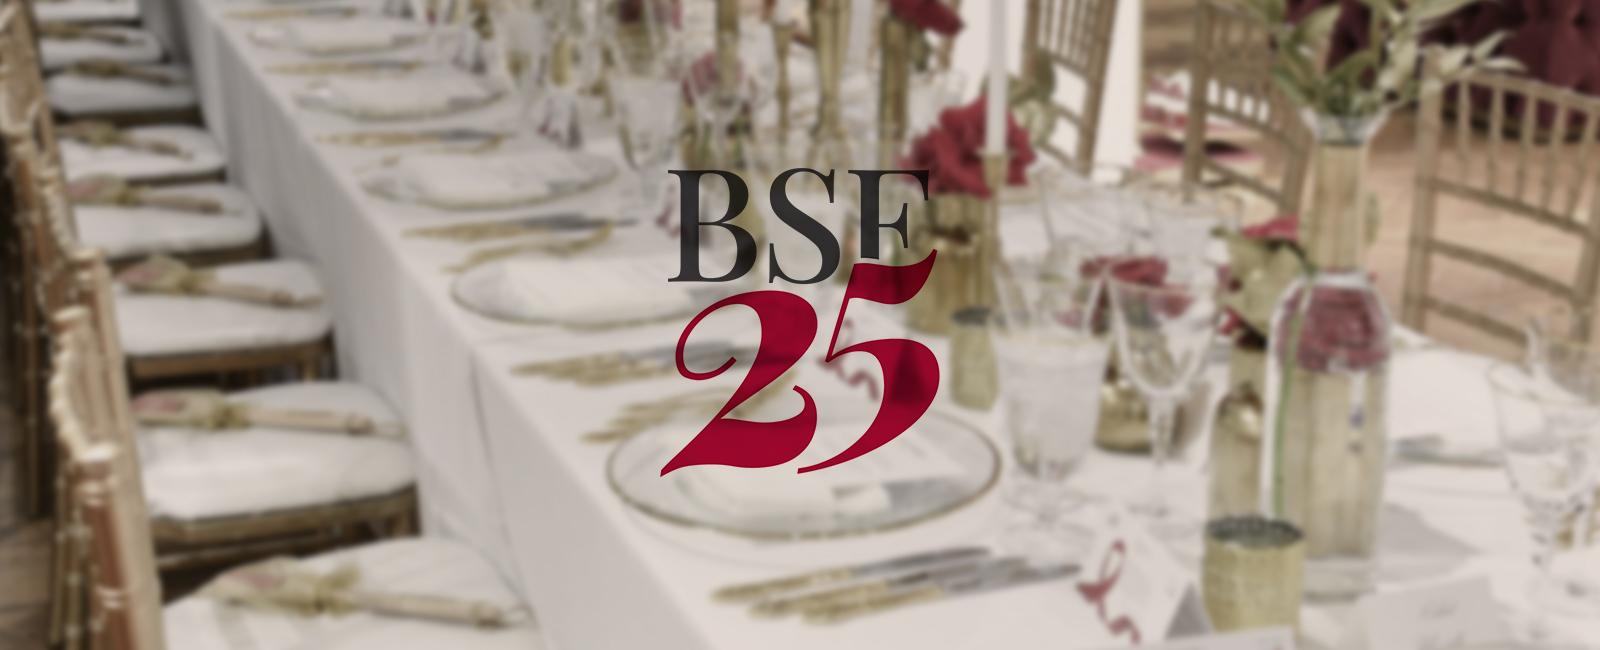 BSE25-Carousel